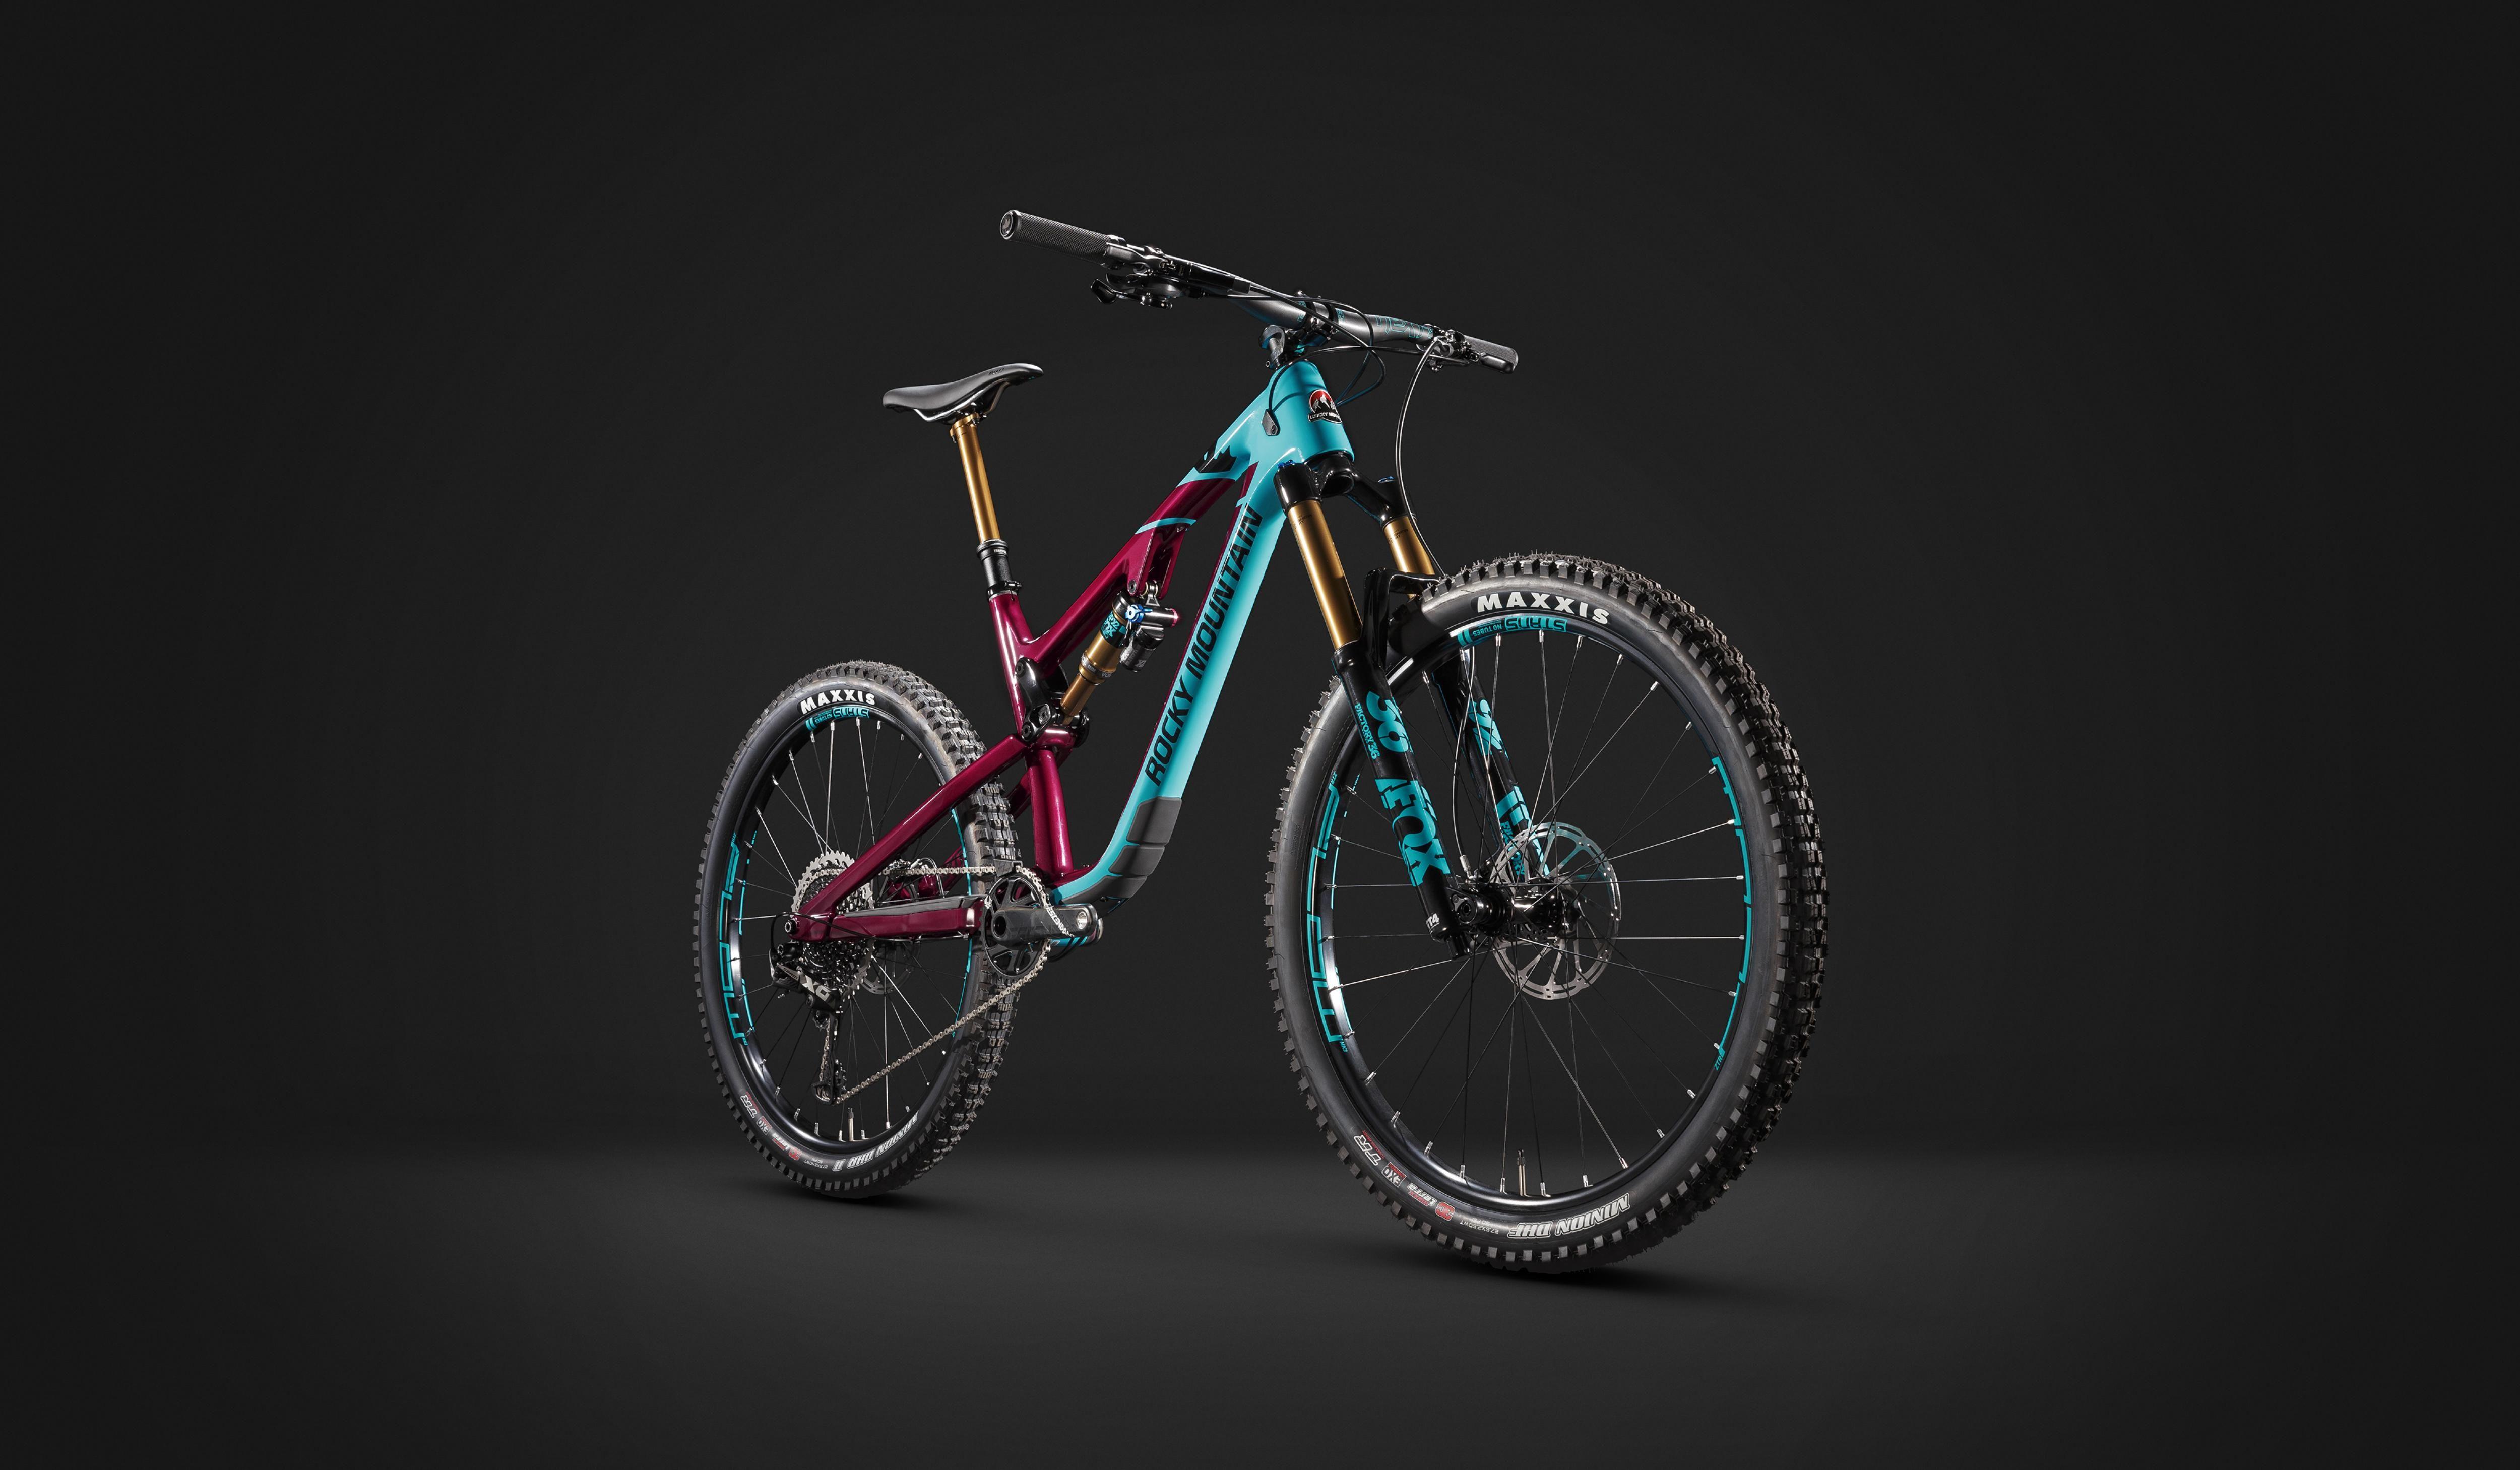 Altitude Montain Bike Rocky Mountains Bike